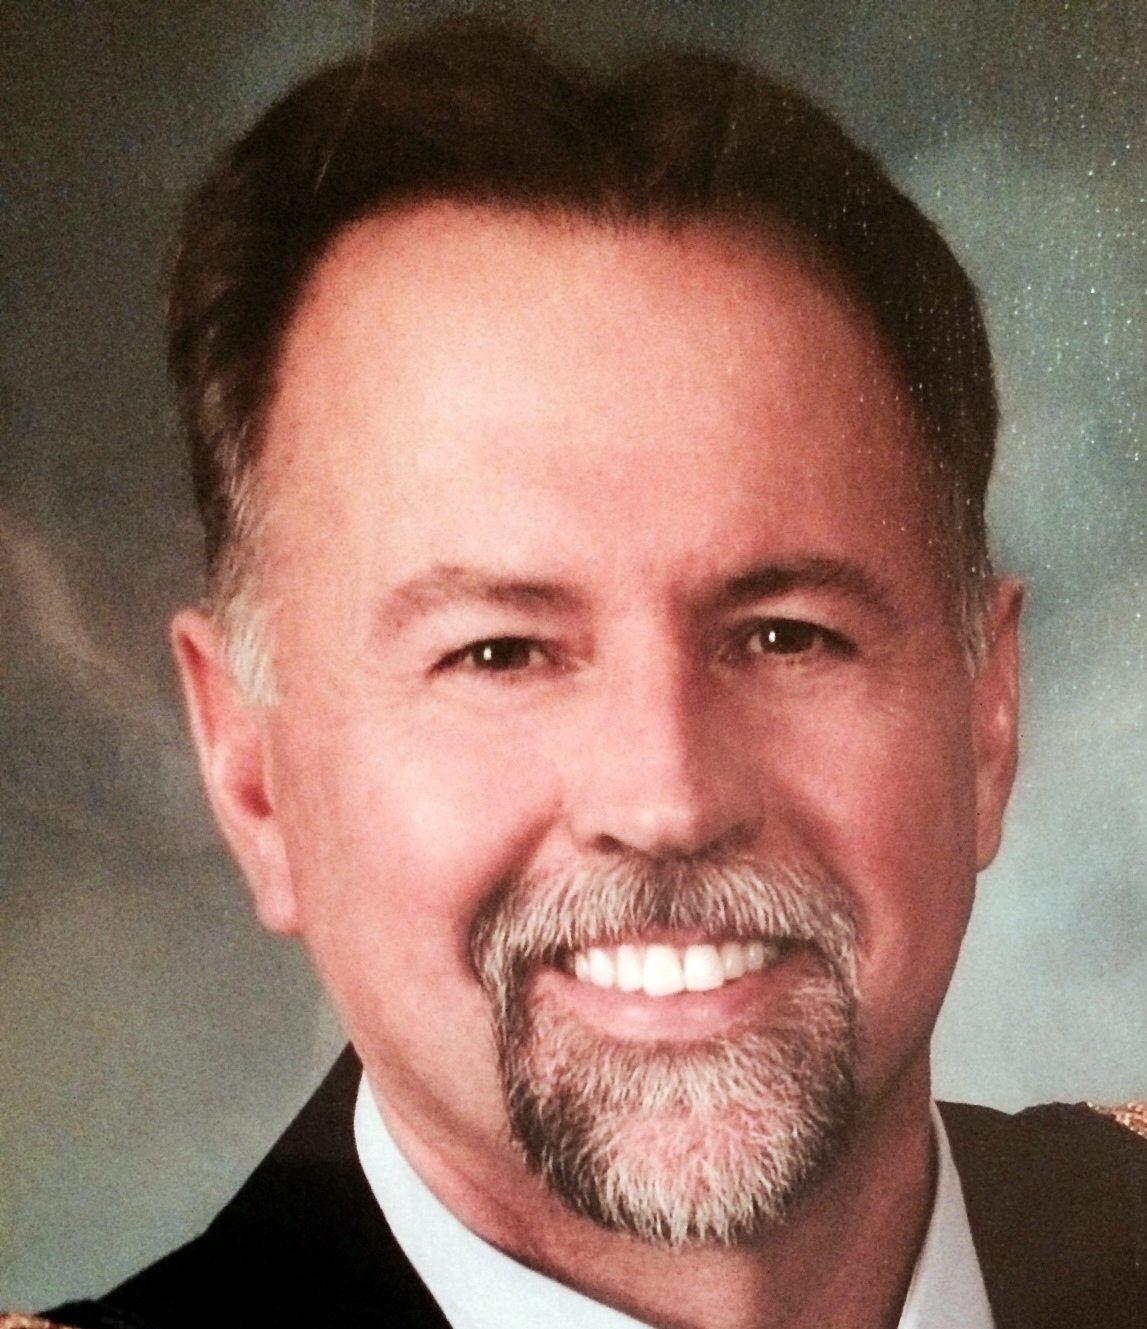 McBride has lengthy law enforcement history